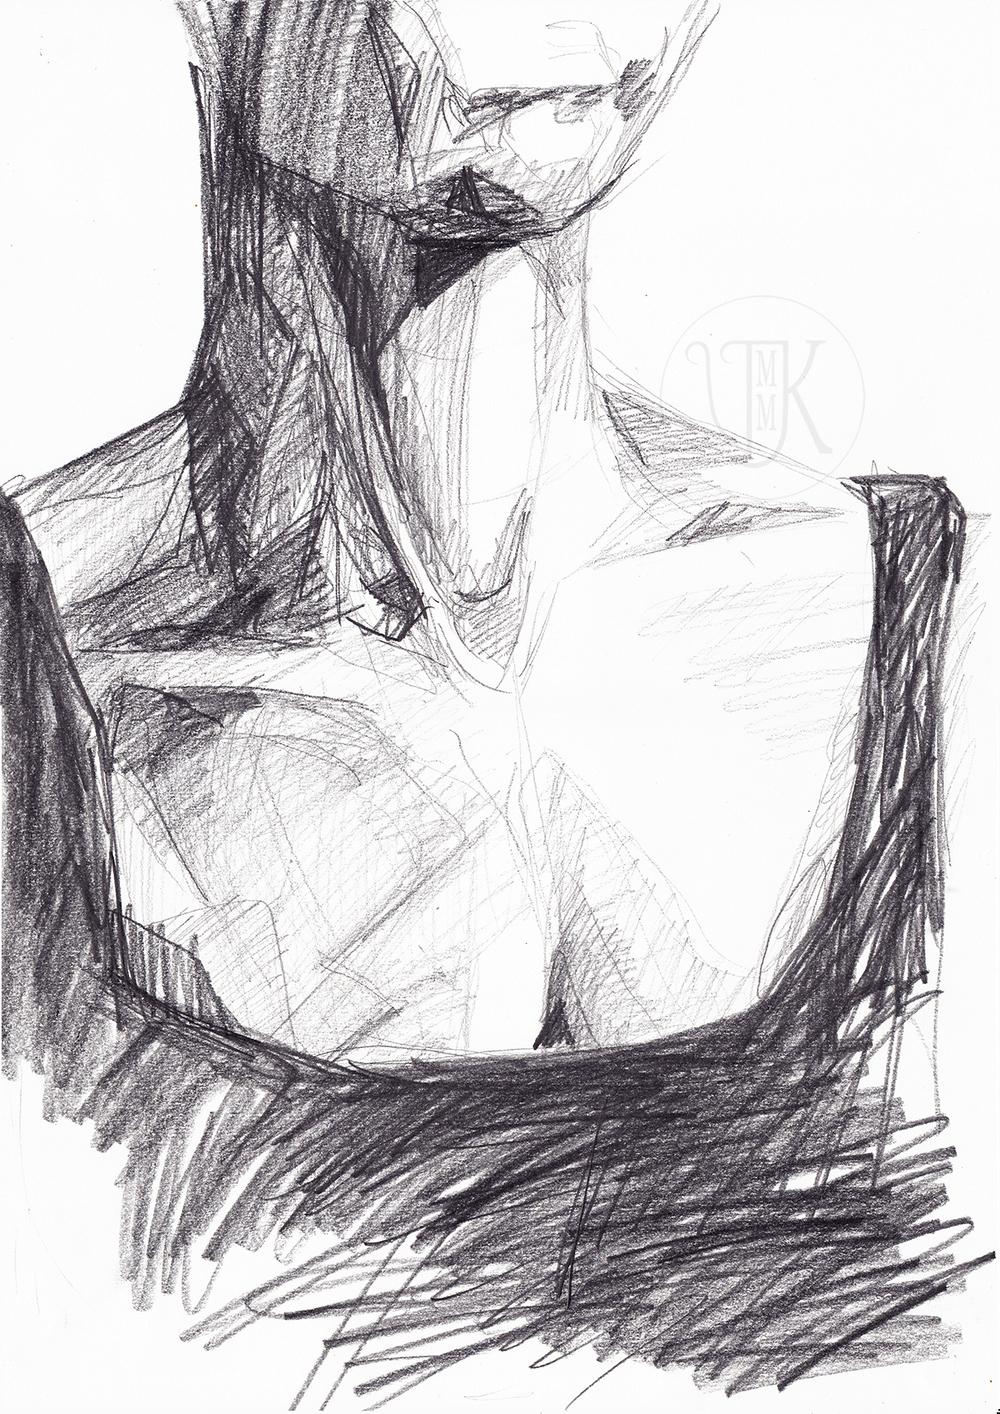 Graphite on a paper, A3, 2016